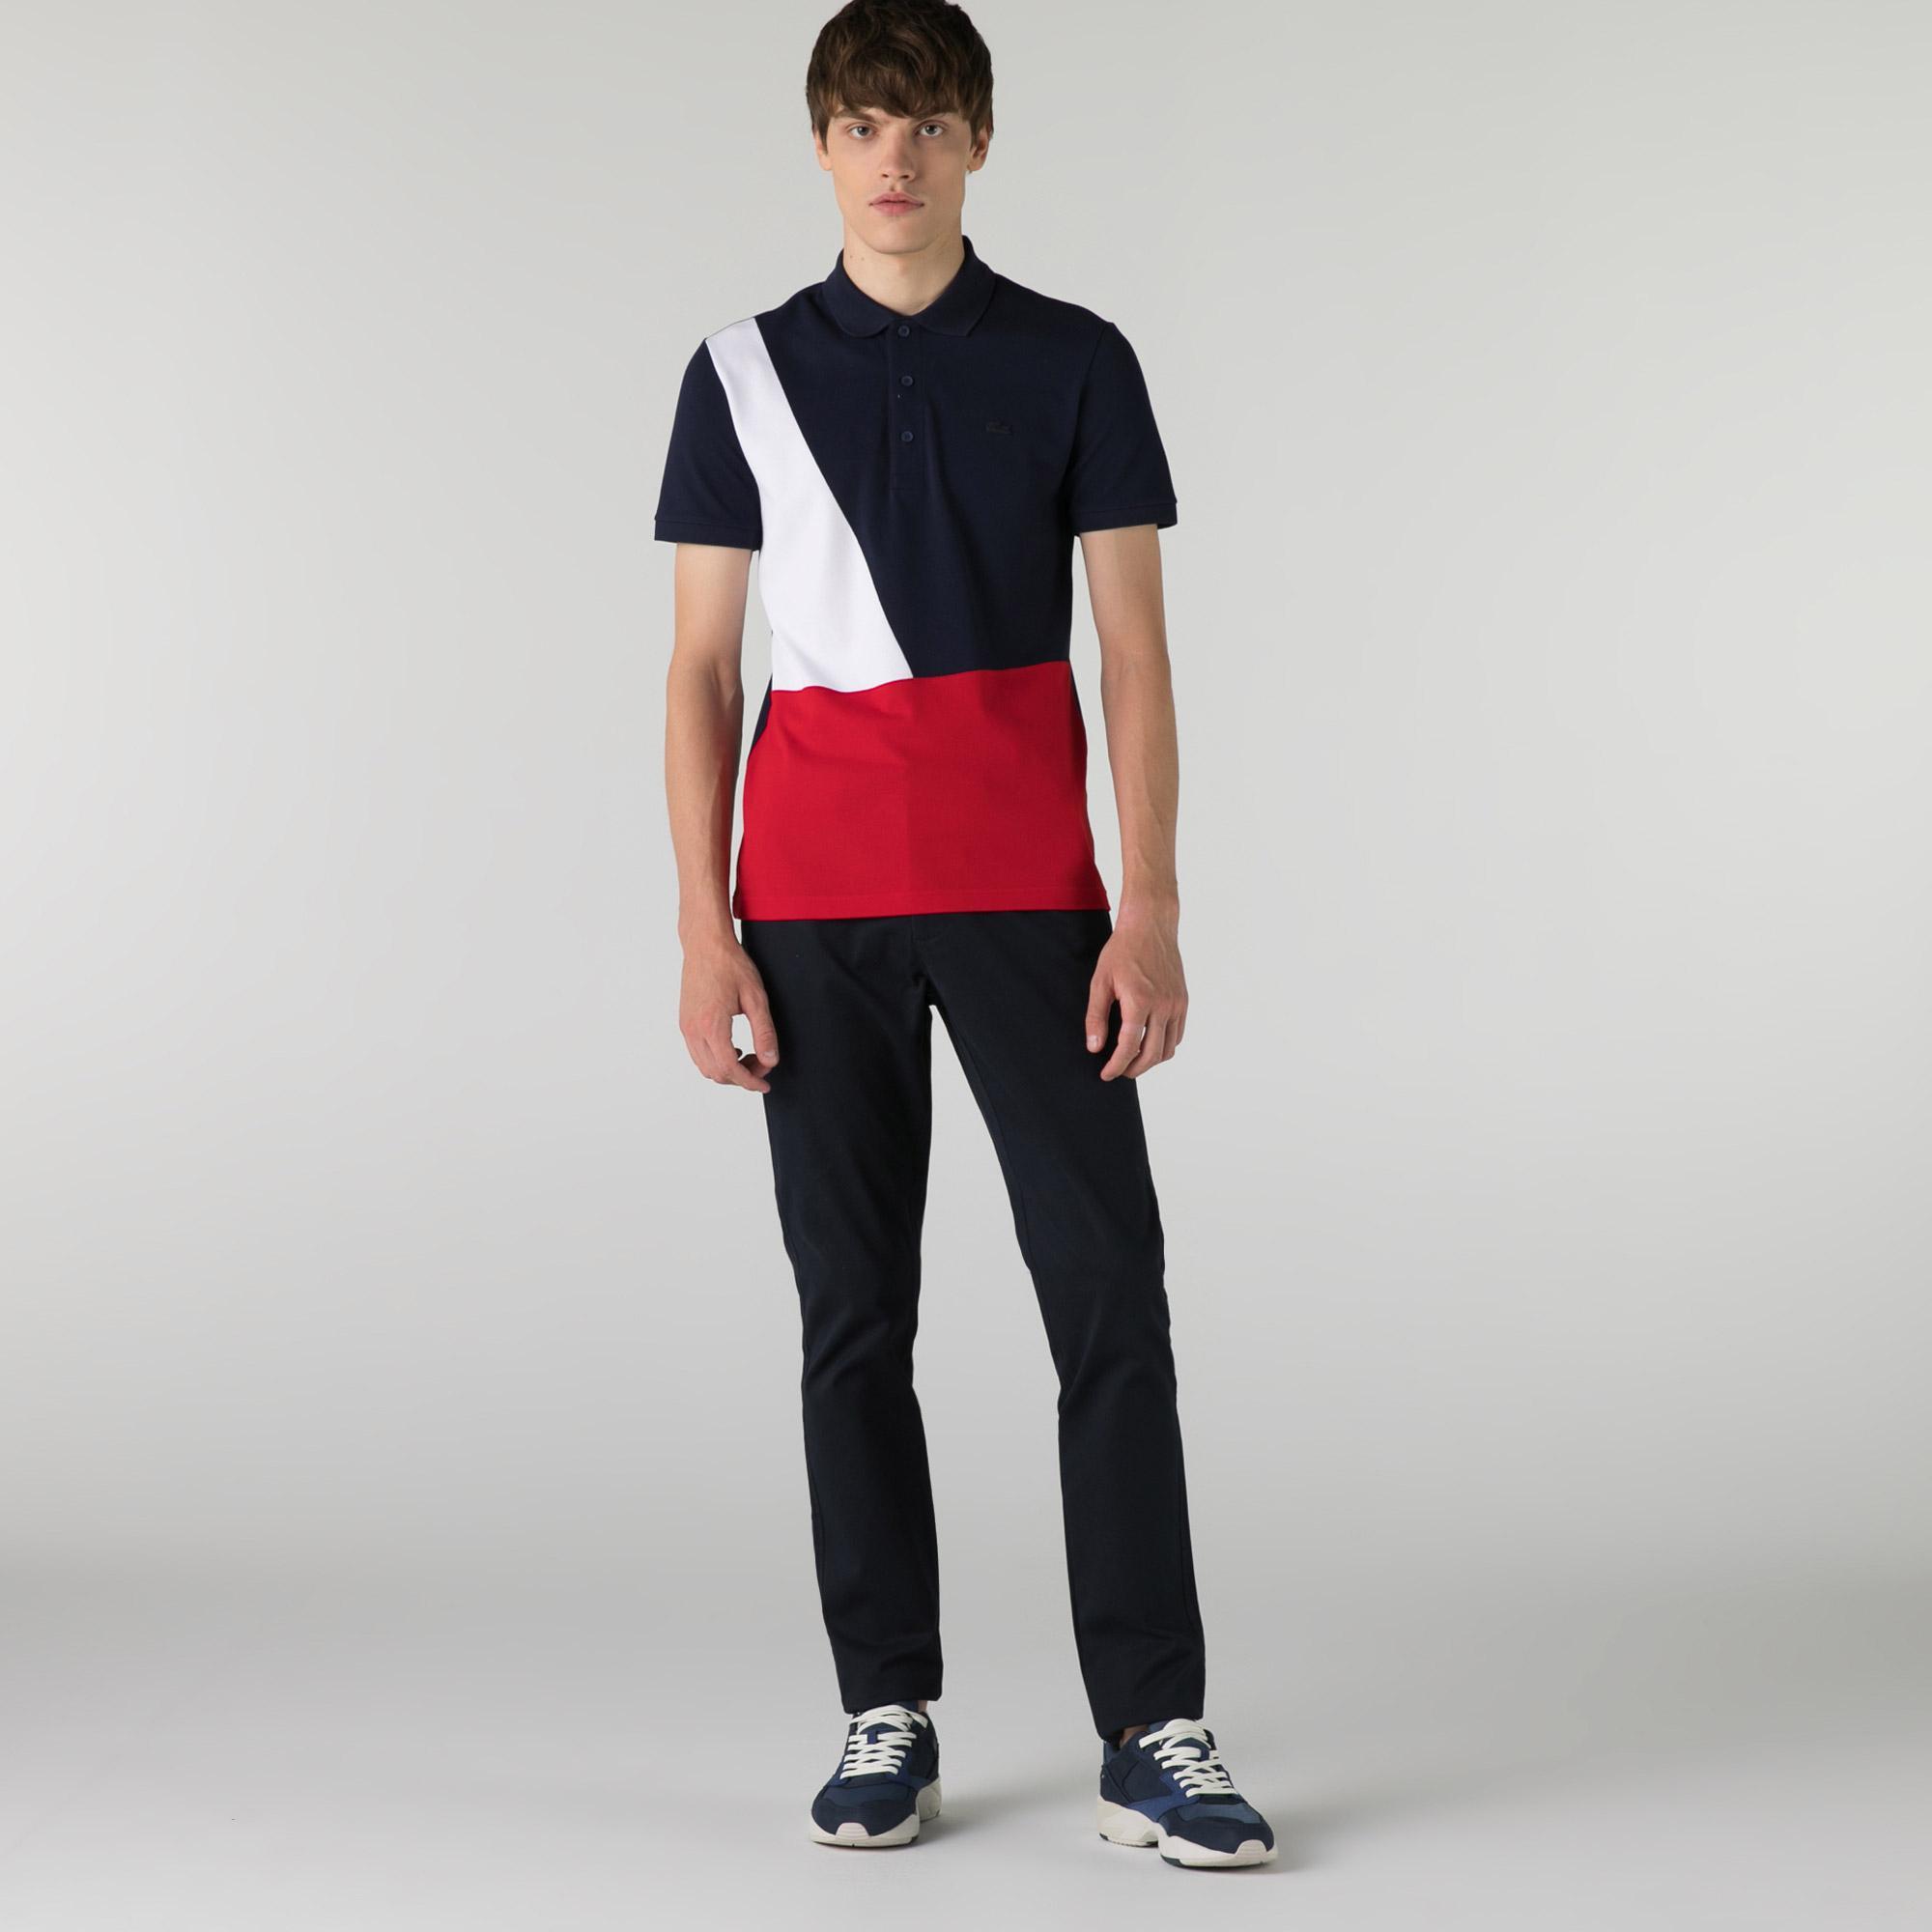 Lacoste Men's Trousers